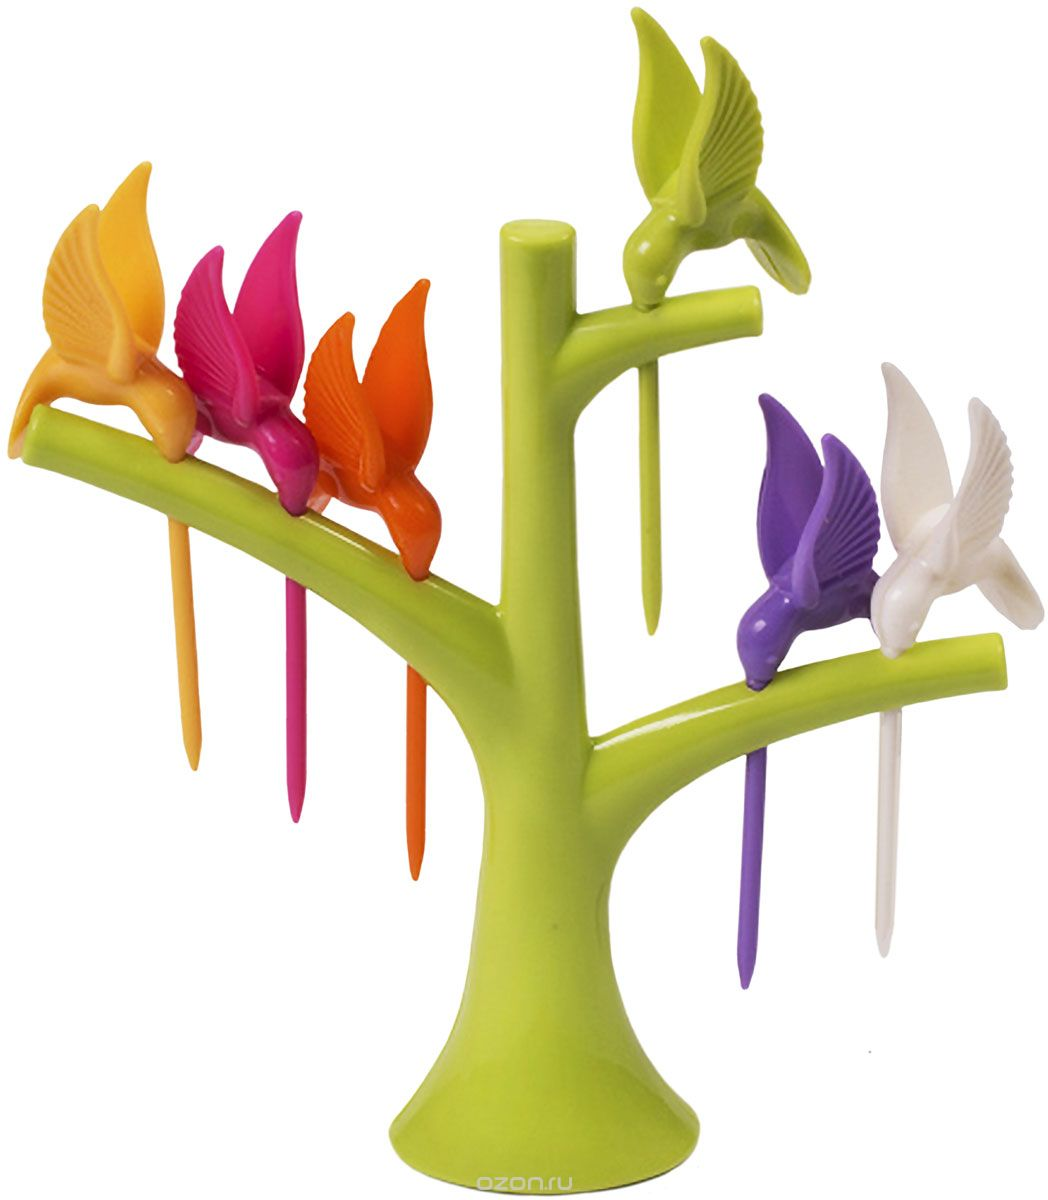 Набор шпажек для канапе Magic Home Птицы, с подставкой, 6 предметов набор шпажек для канапе обезьянки 6шт с подставкой